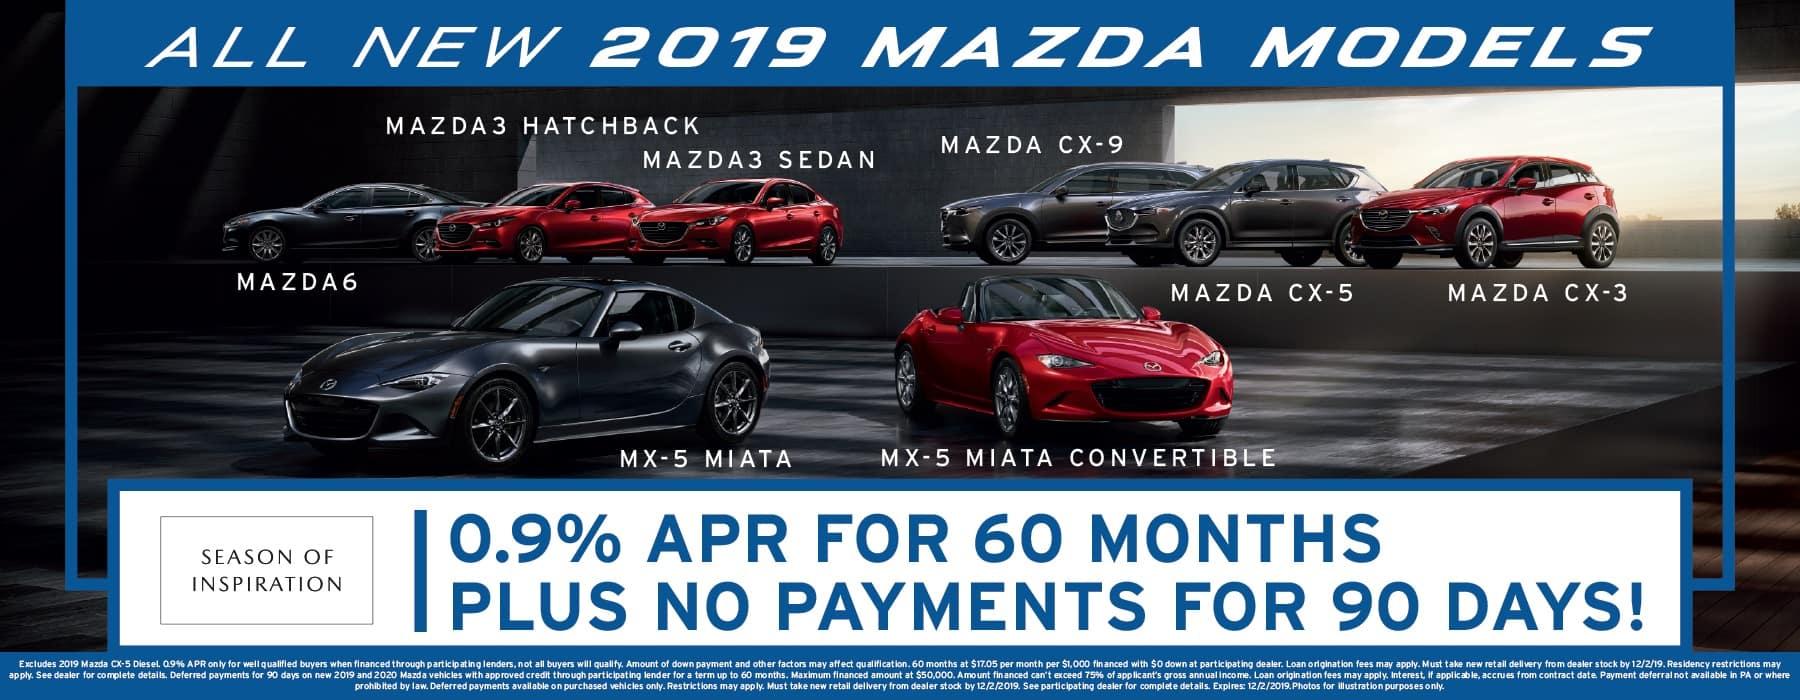 Mazda Dealerships In Georgia >> New Used Car And Suv Dealer Mall Of Georgia Mazda In